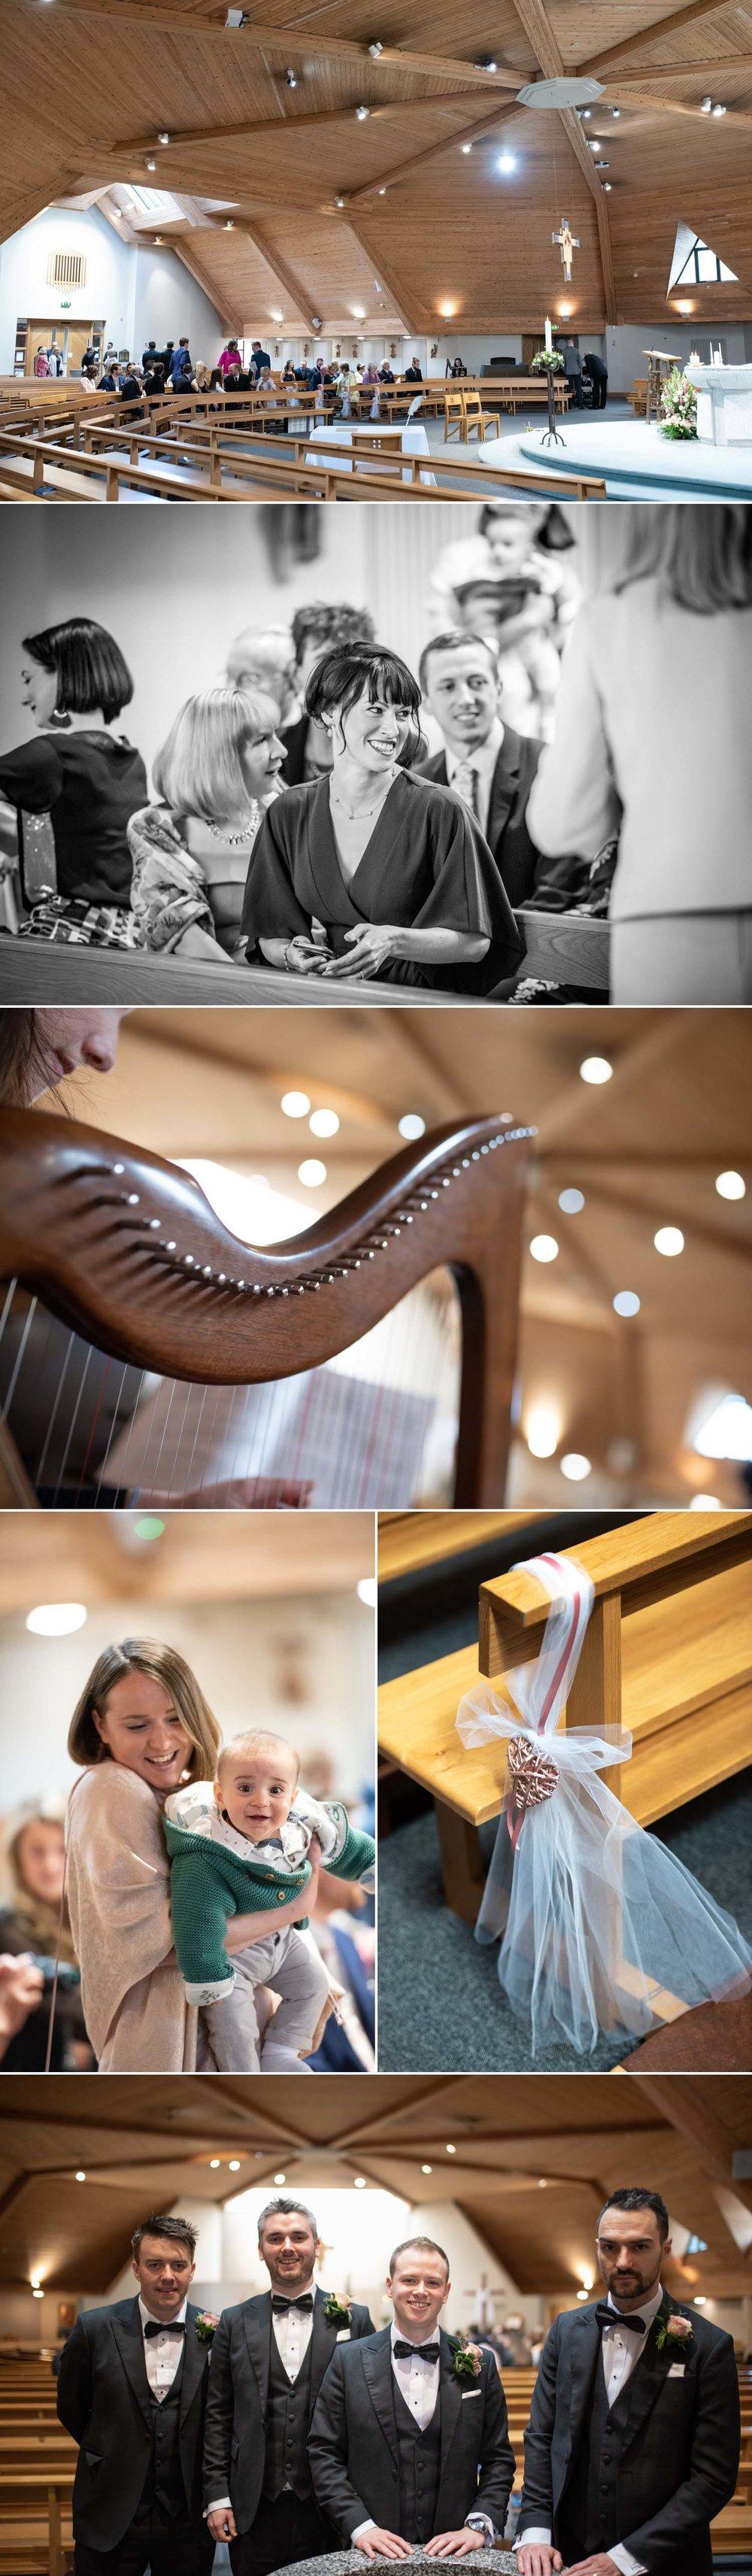 Merchant Hotel Belfast Wedding Photography James McGrillis 07.jpg